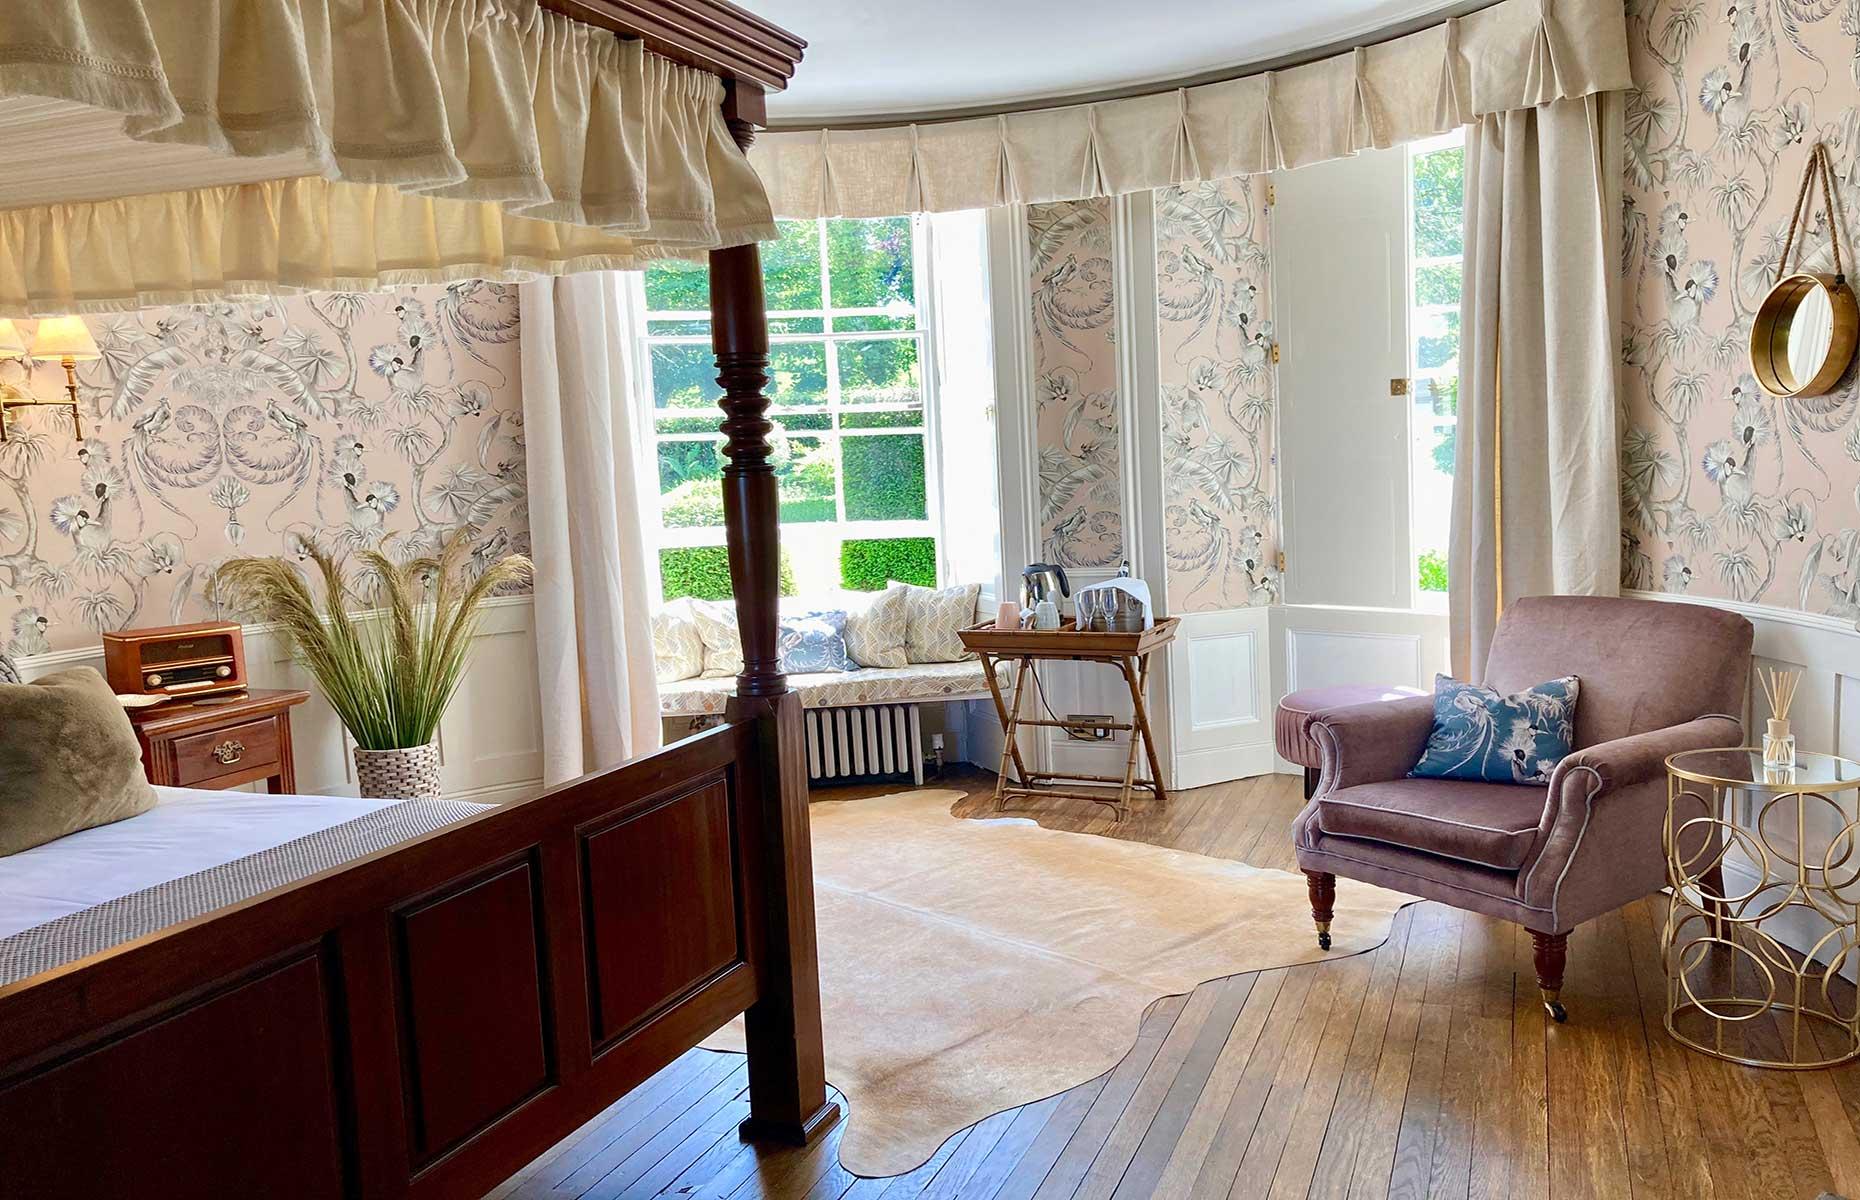 Burleigh Court bedroom (Image: Burleigh Court Photography)